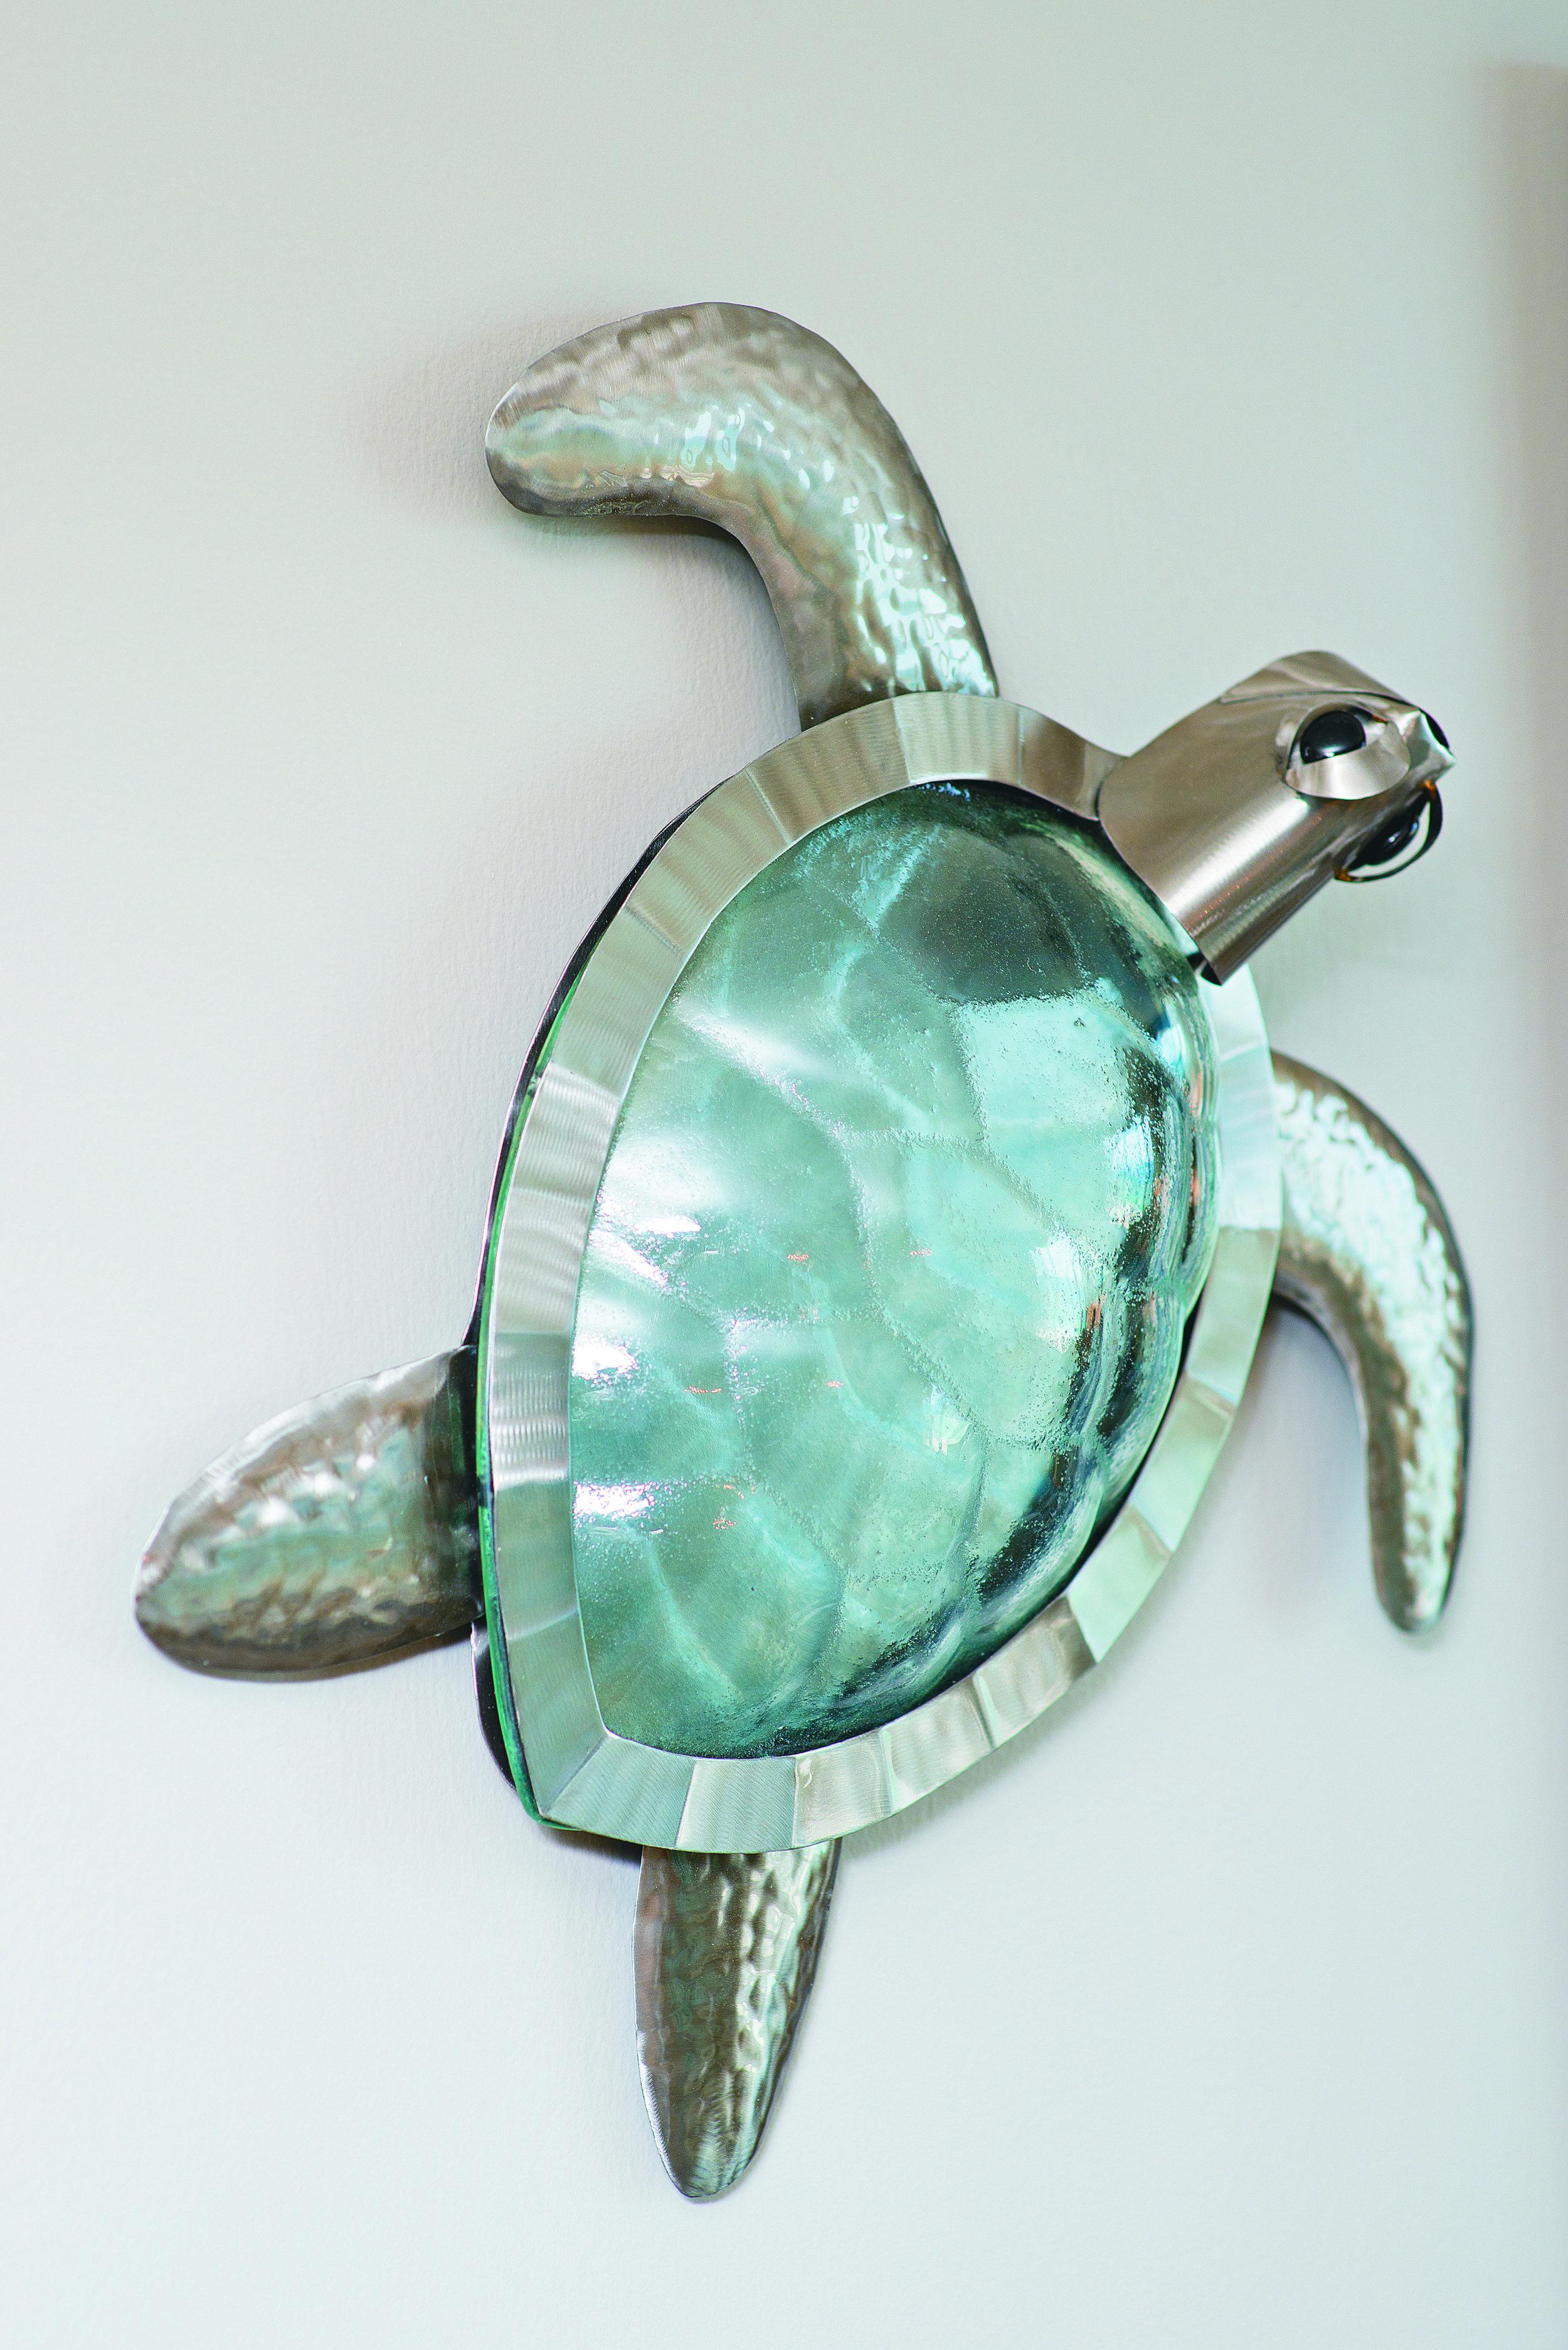 rsz_turtle.jpg